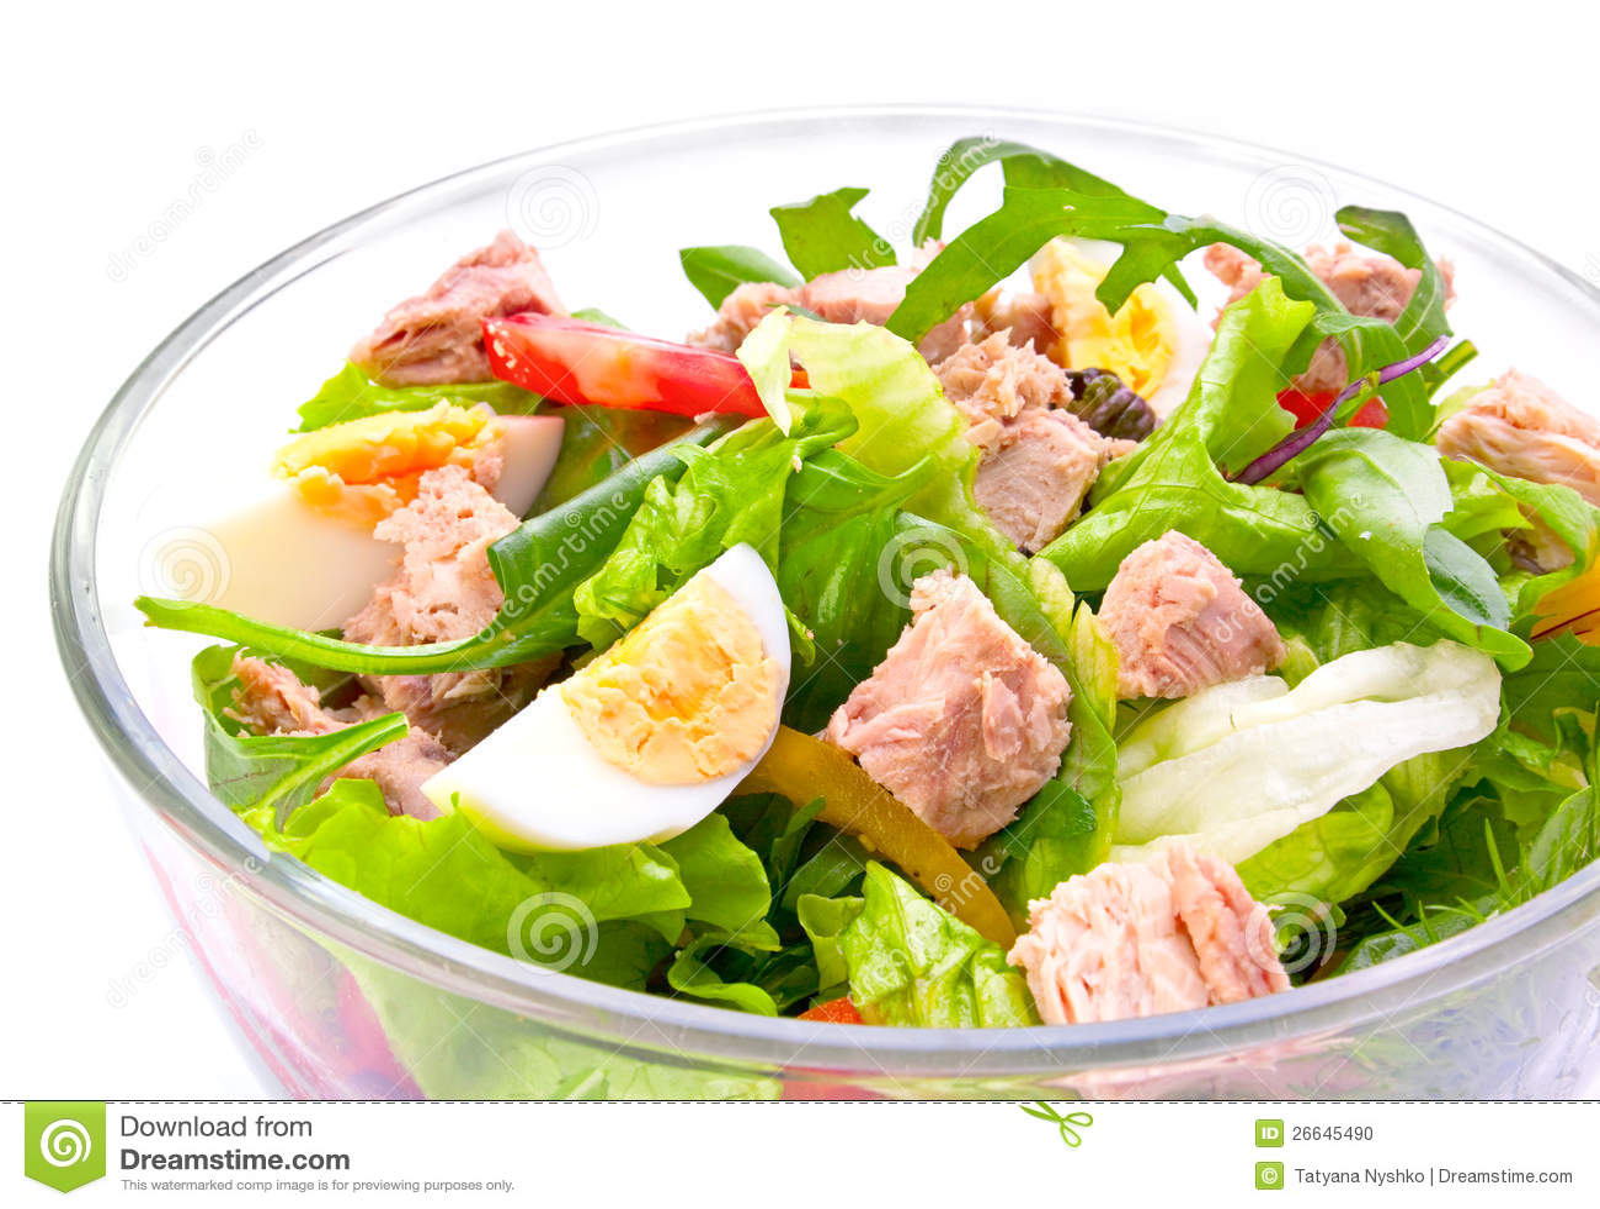 Salad with tuna fish stock photo image 26645490 for How to make tuna fish with eggs